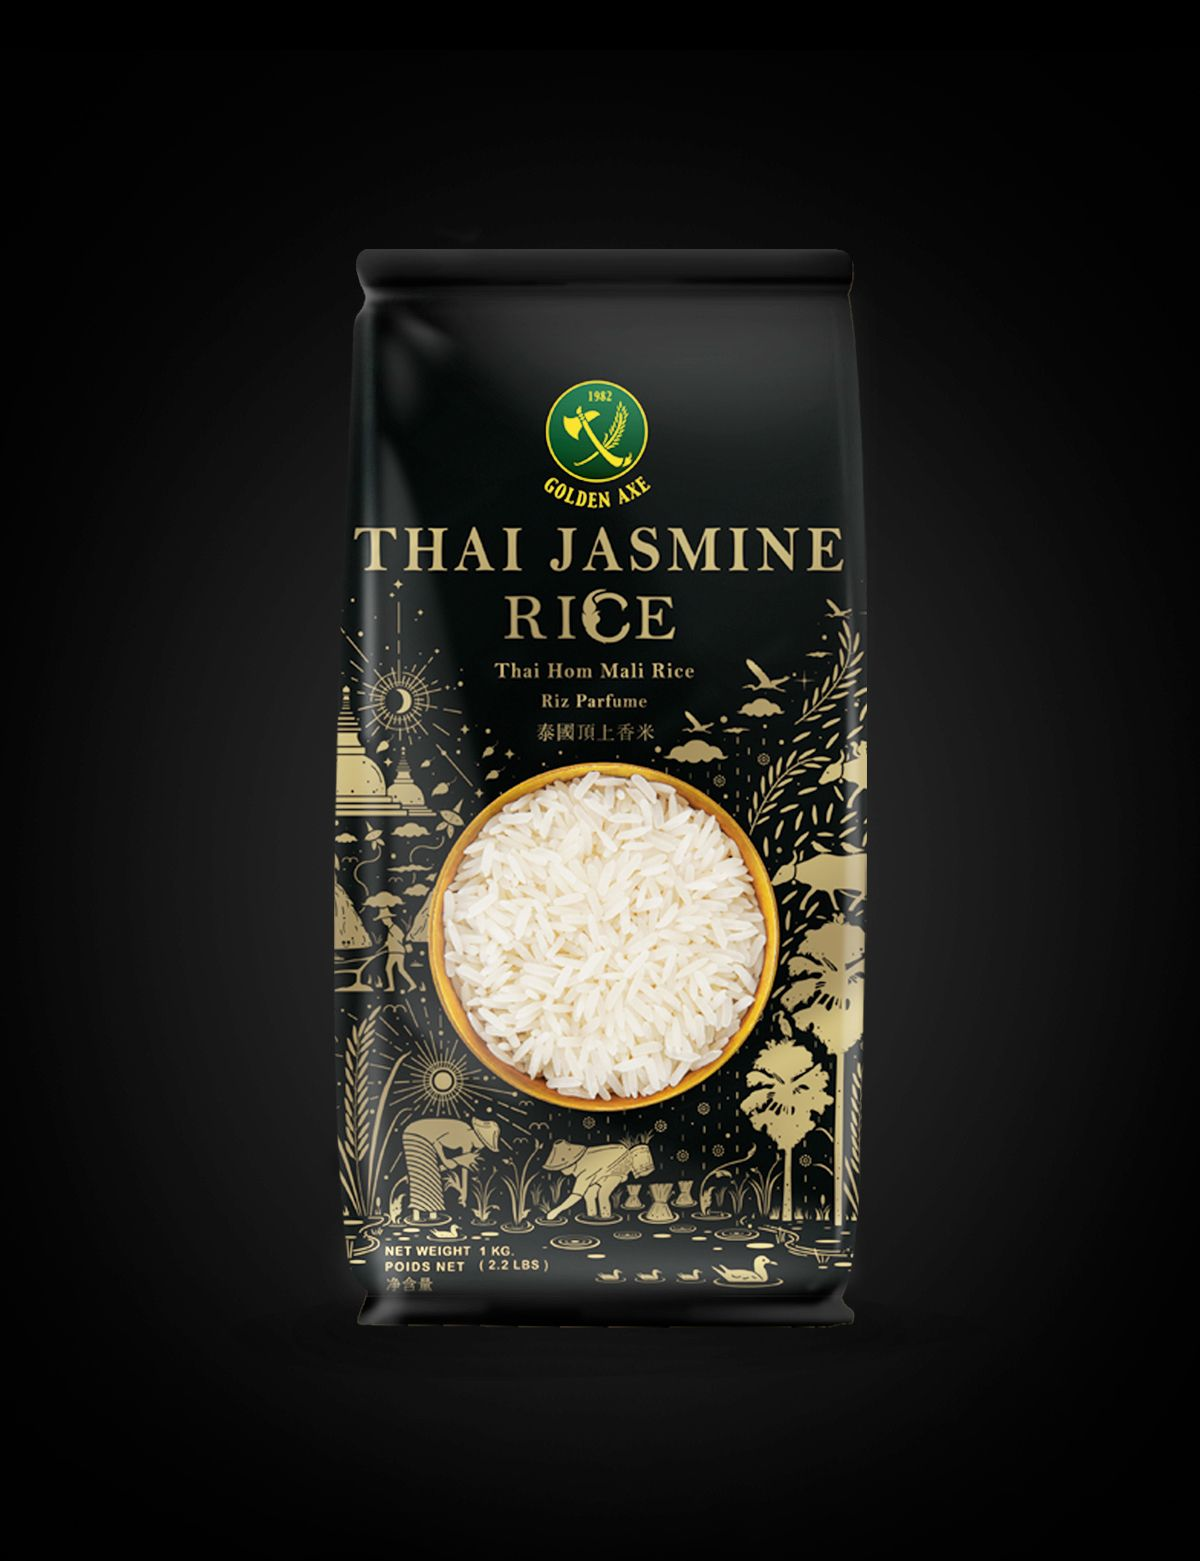 Download Golden Axe Thai Jasmine Rice On Behance ผล ตภ ณฑ เพ อส ขภาพ ผล ตภ ณฑ ห บห อบรรจ ภ ณฑ